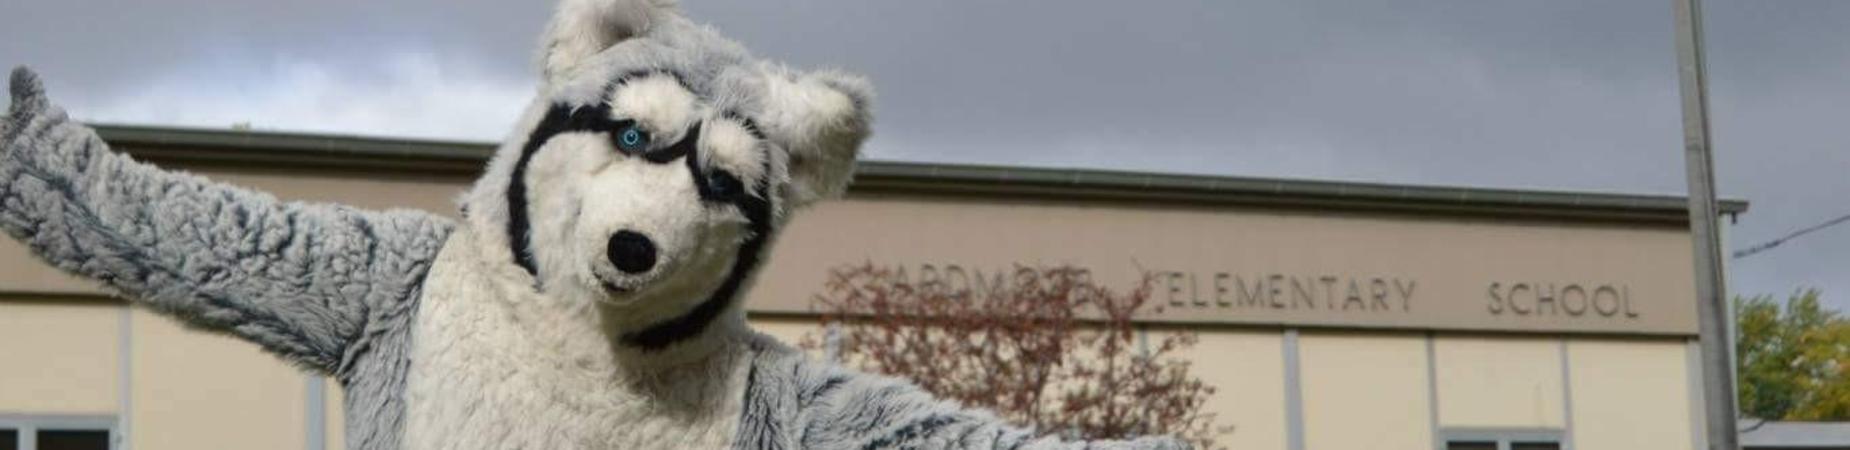 Husky Standing Outside Ardmore Elementary